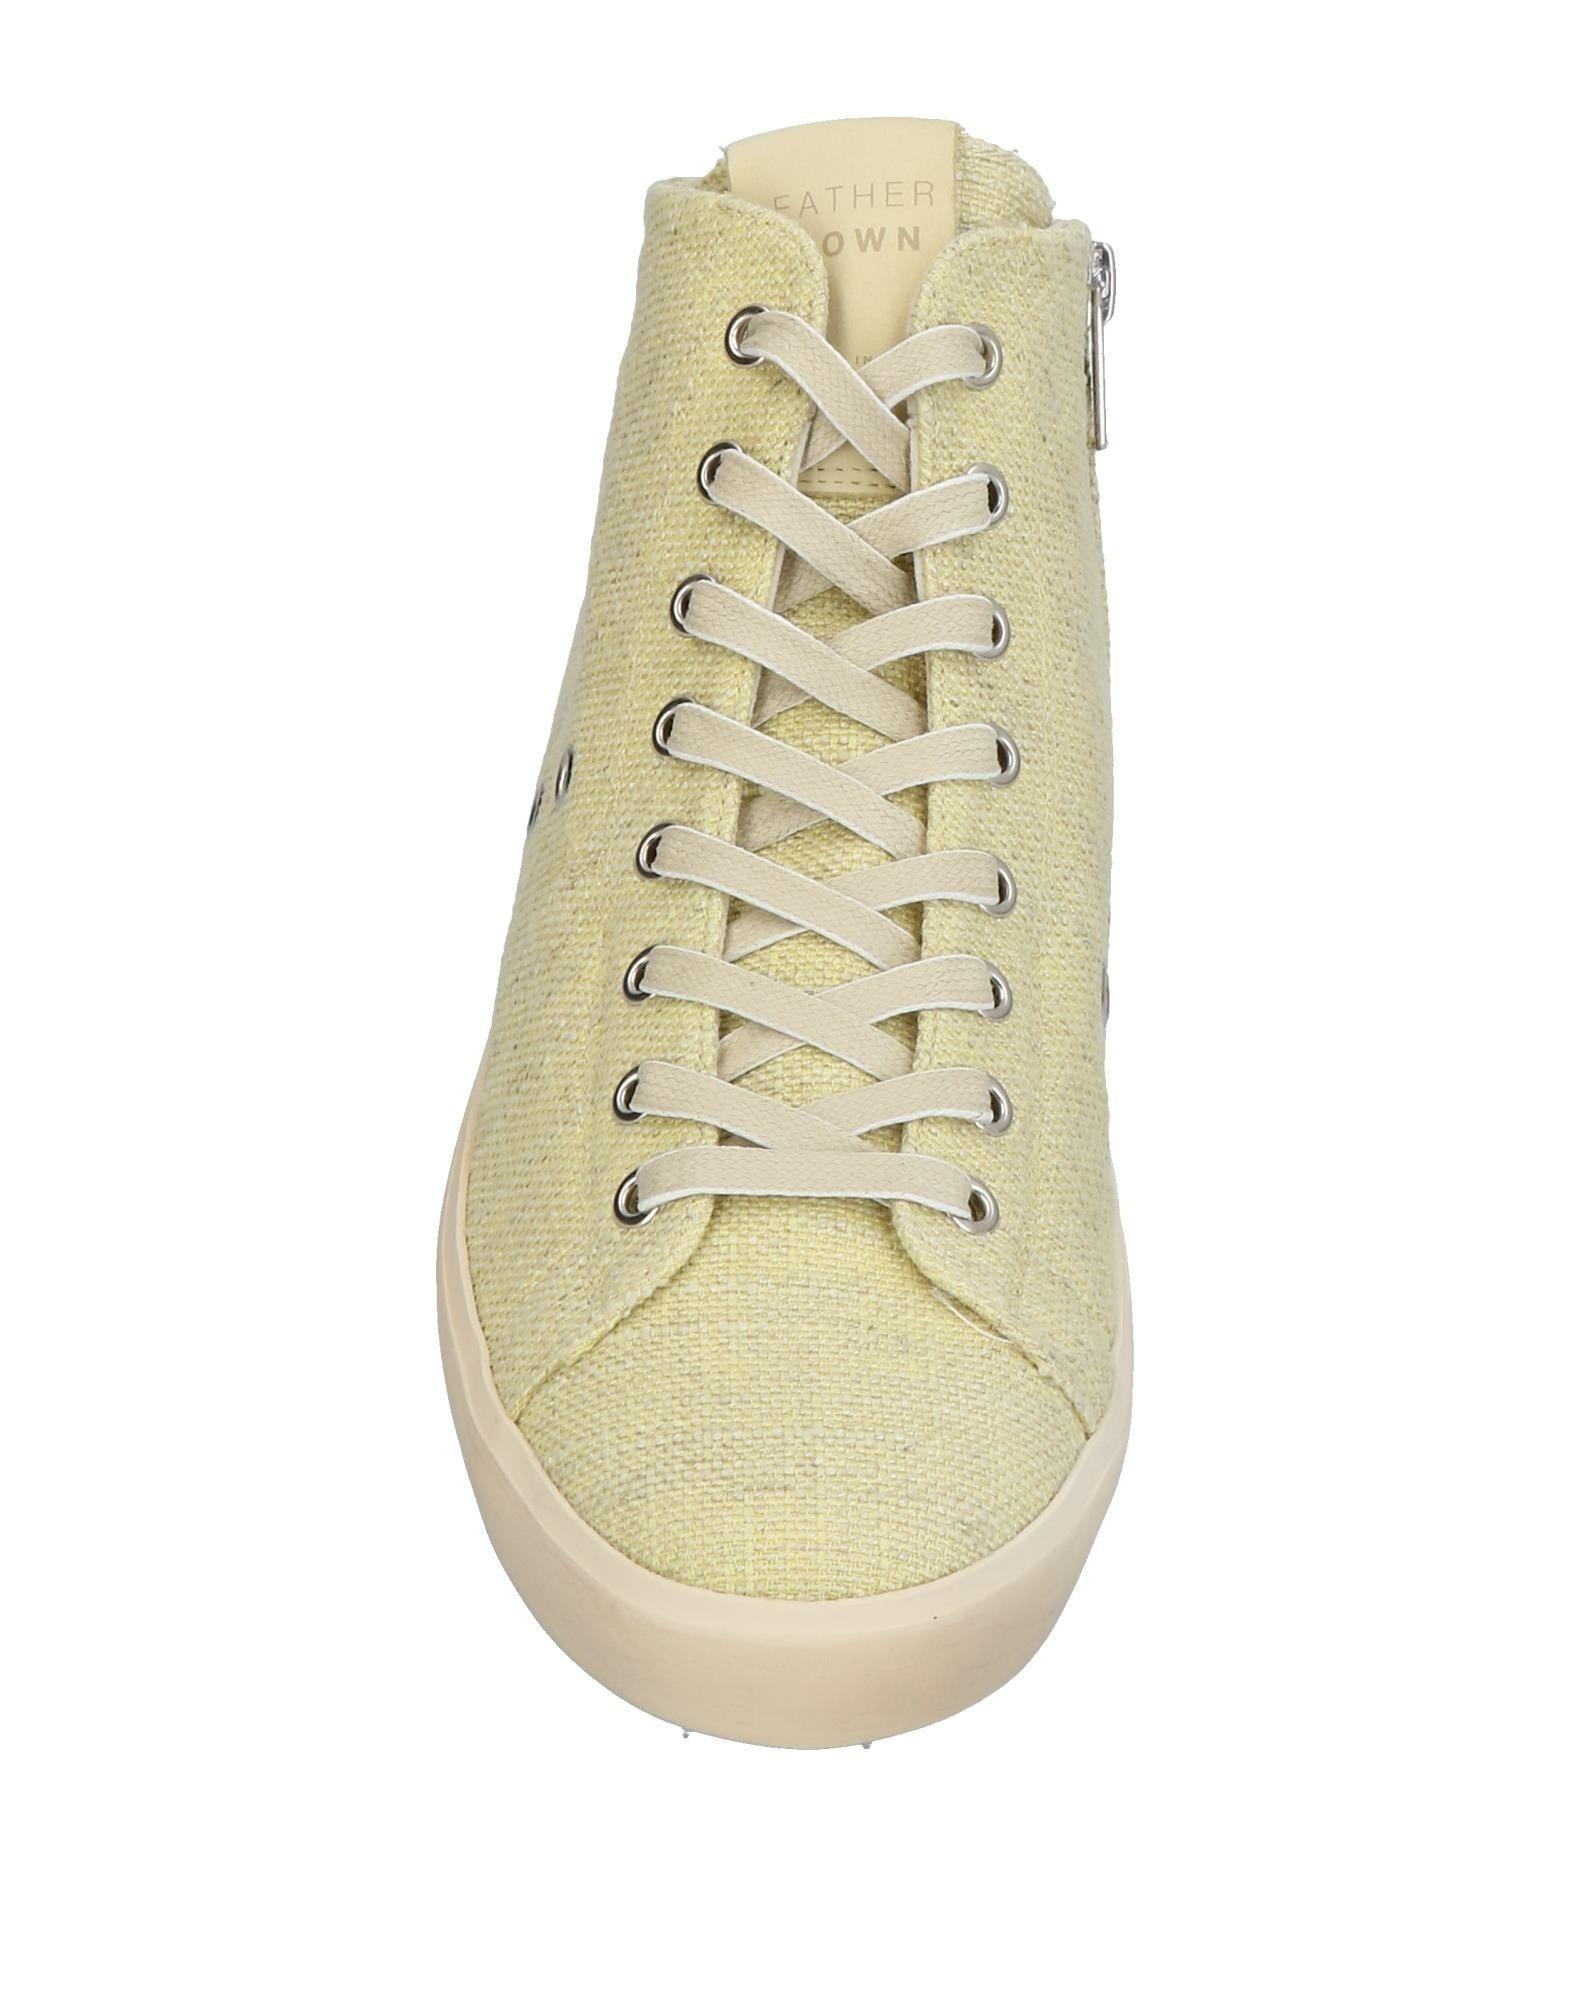 Gut um billige Schuhe zu tragenLeather Crown Sneakers Damen Damen Damen  11385151QM 5a14b7